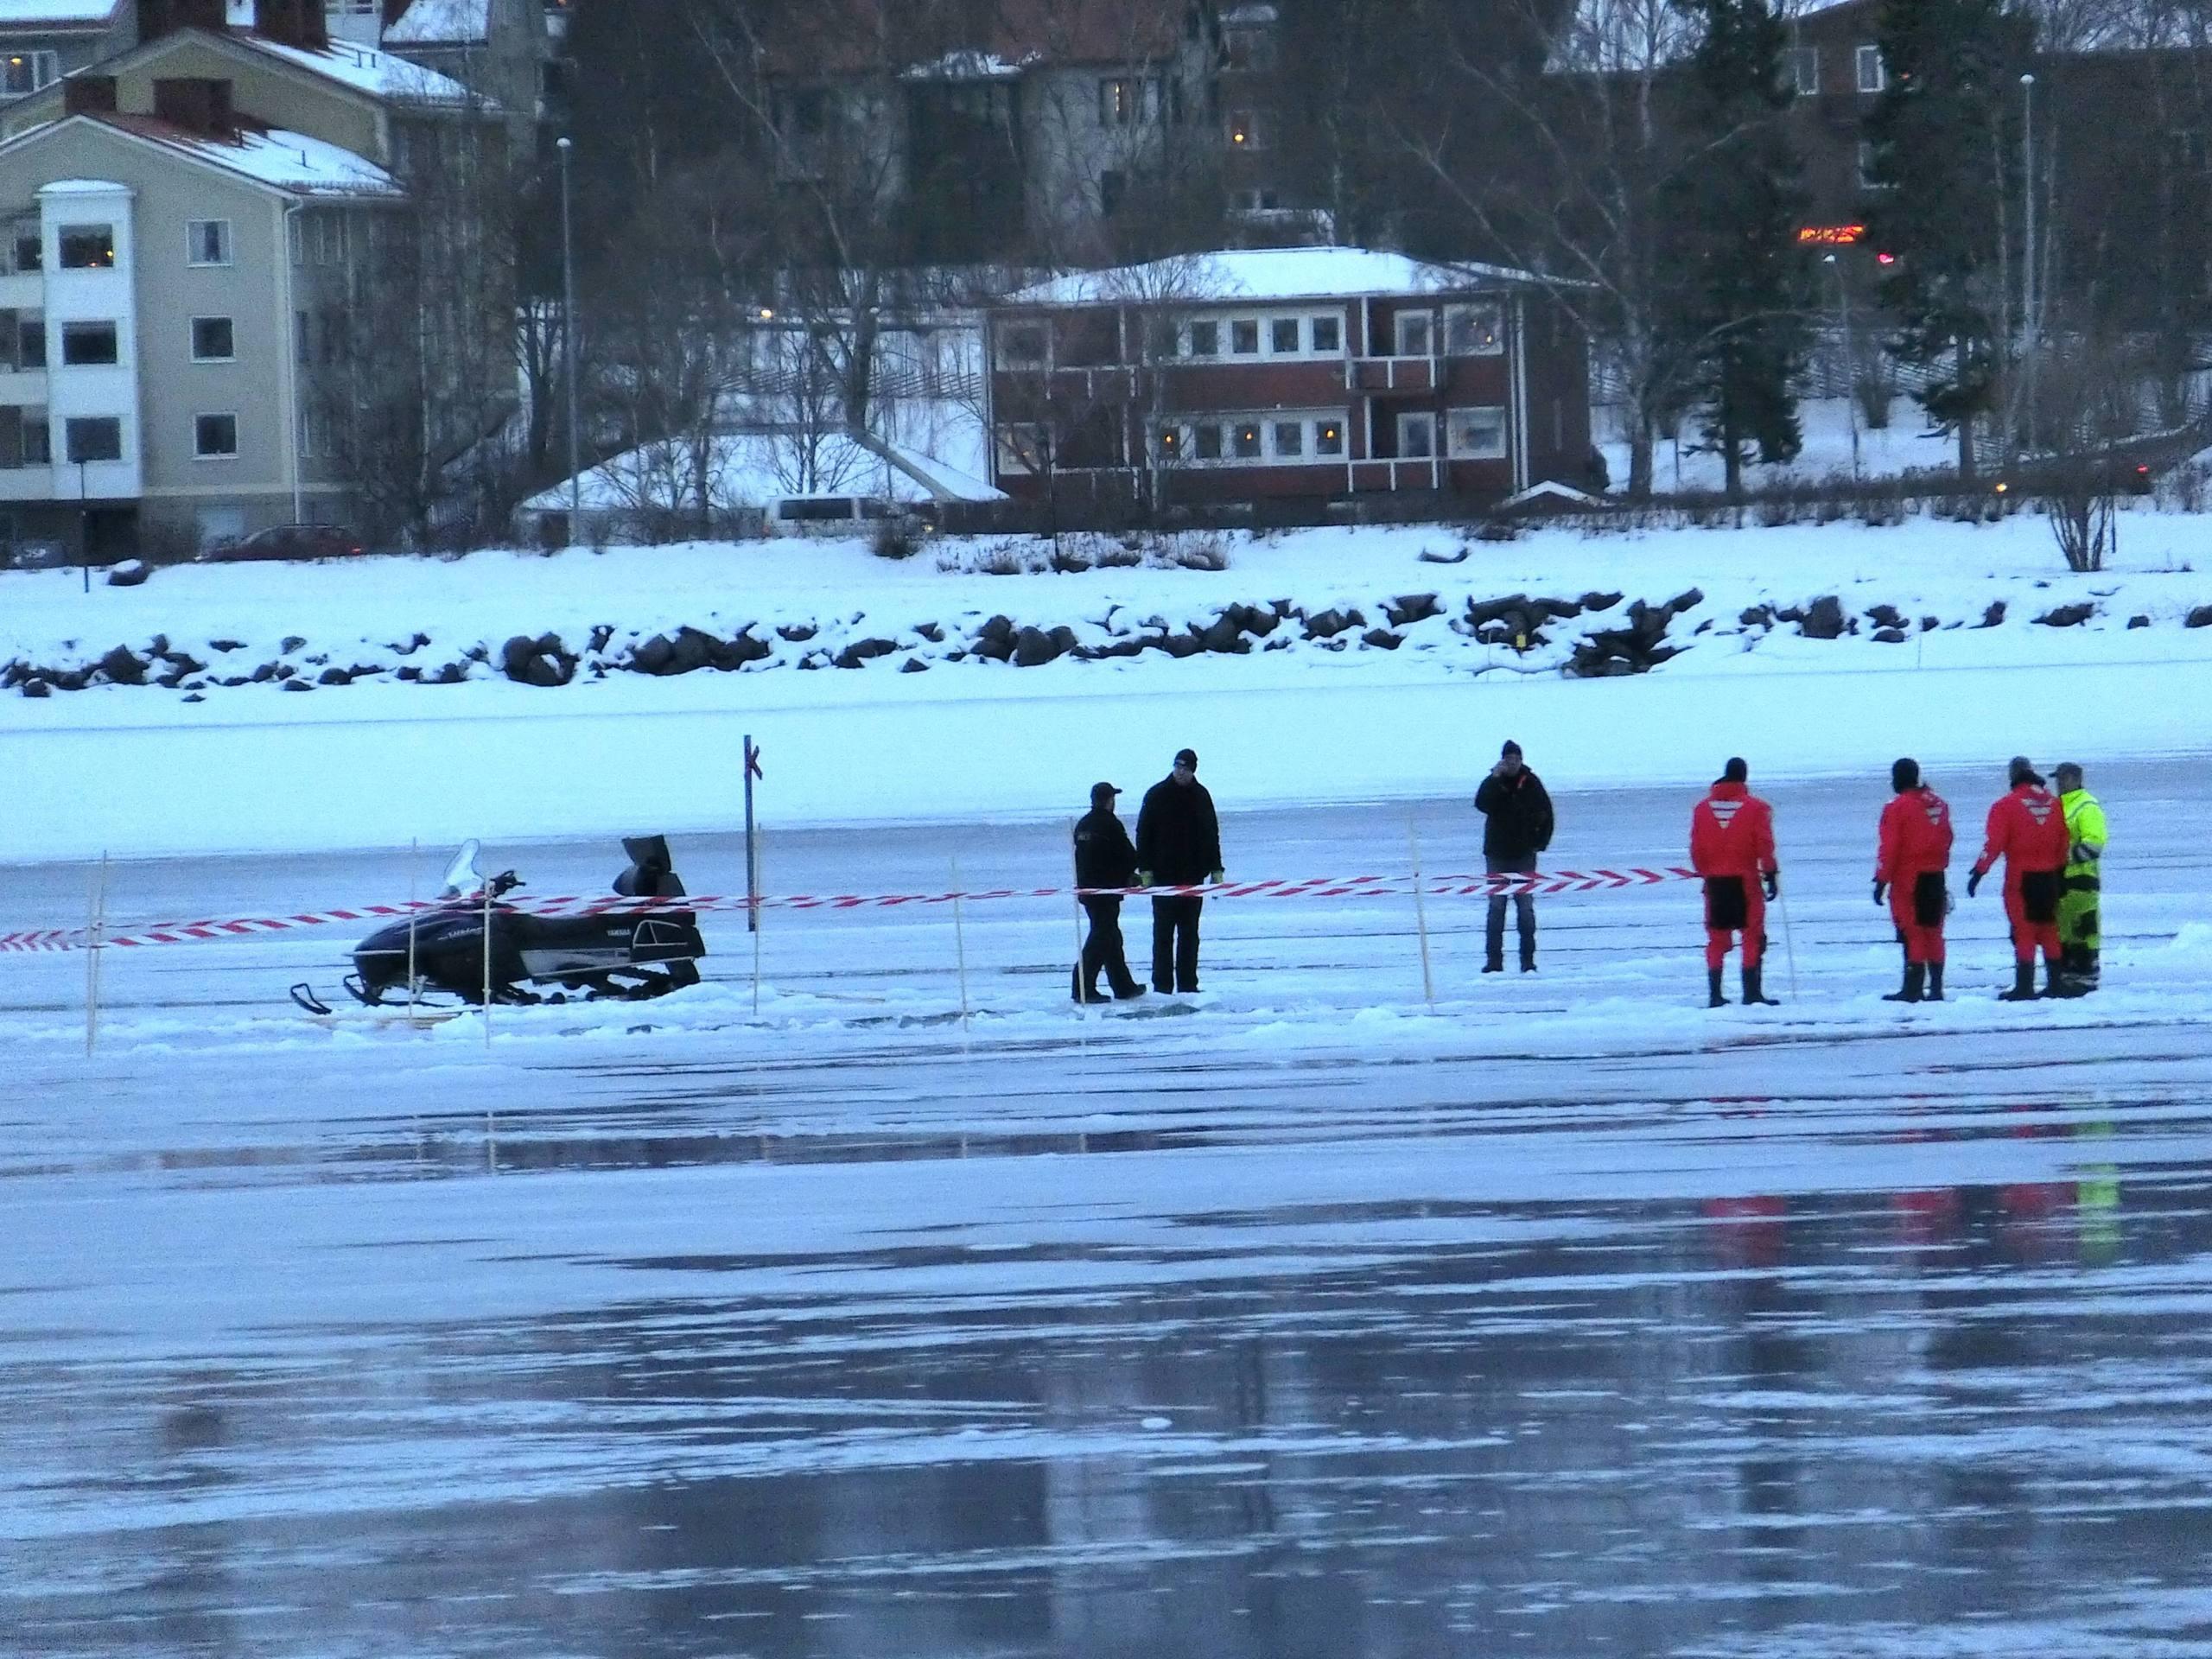 Korde traktor sjonk genom isen